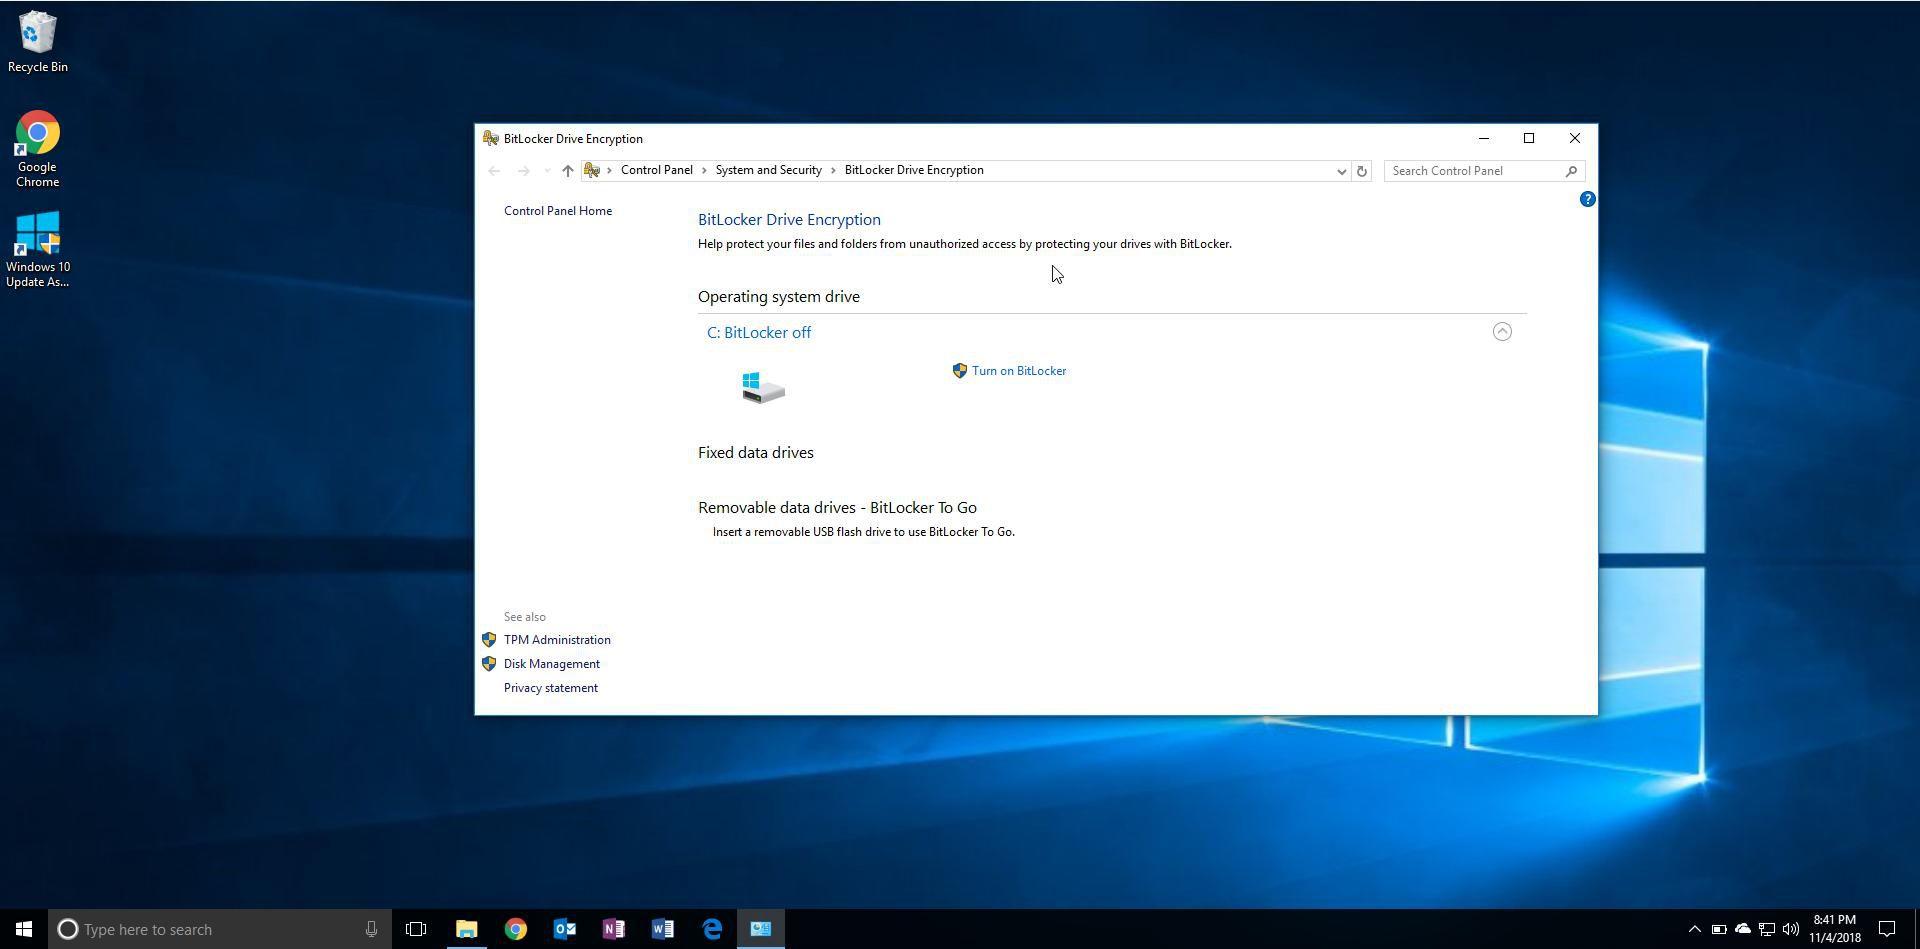 Windows' Bitlocker Drive Encryption Utility